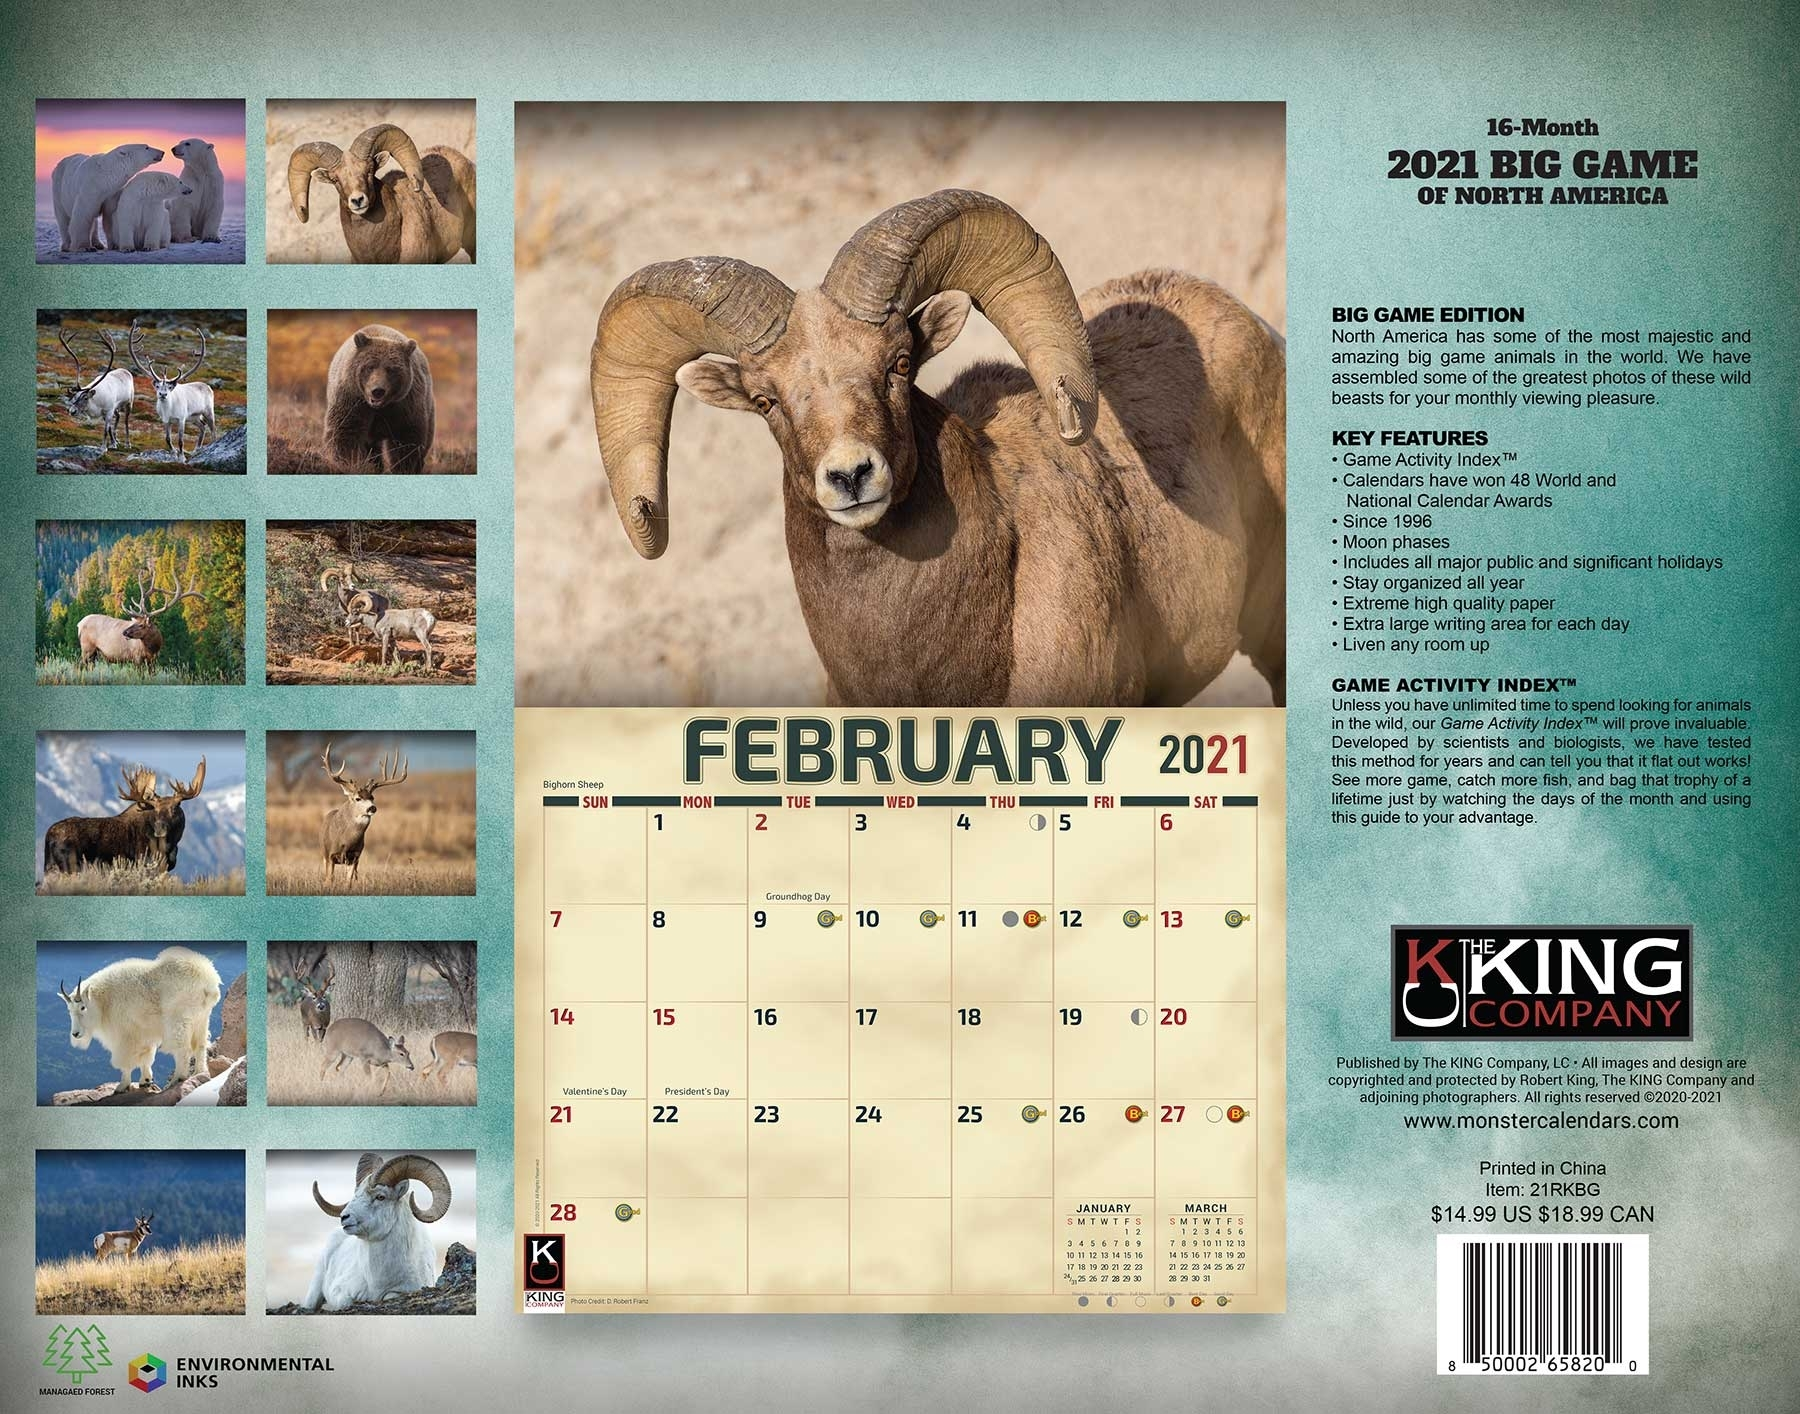 2021 Big Game Calendar